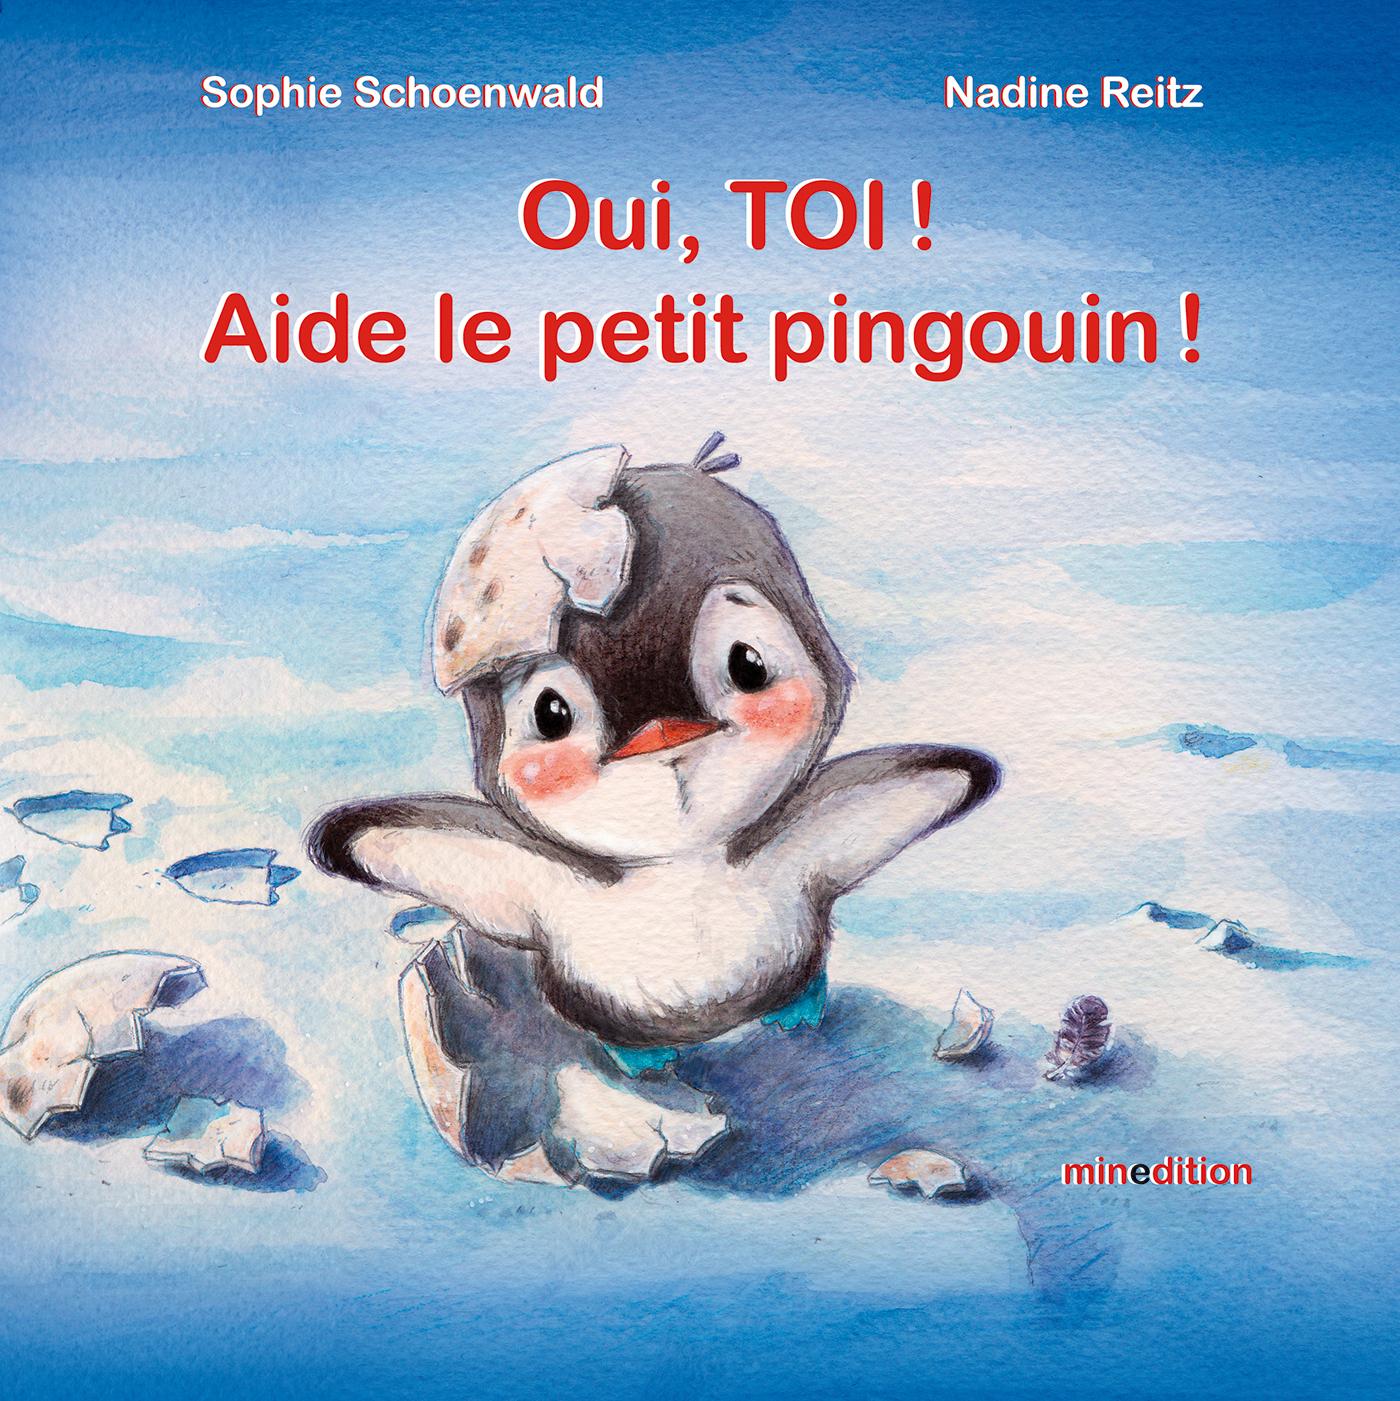 OUI, TOI ! AIDE LE PETIT PINGOUIN !